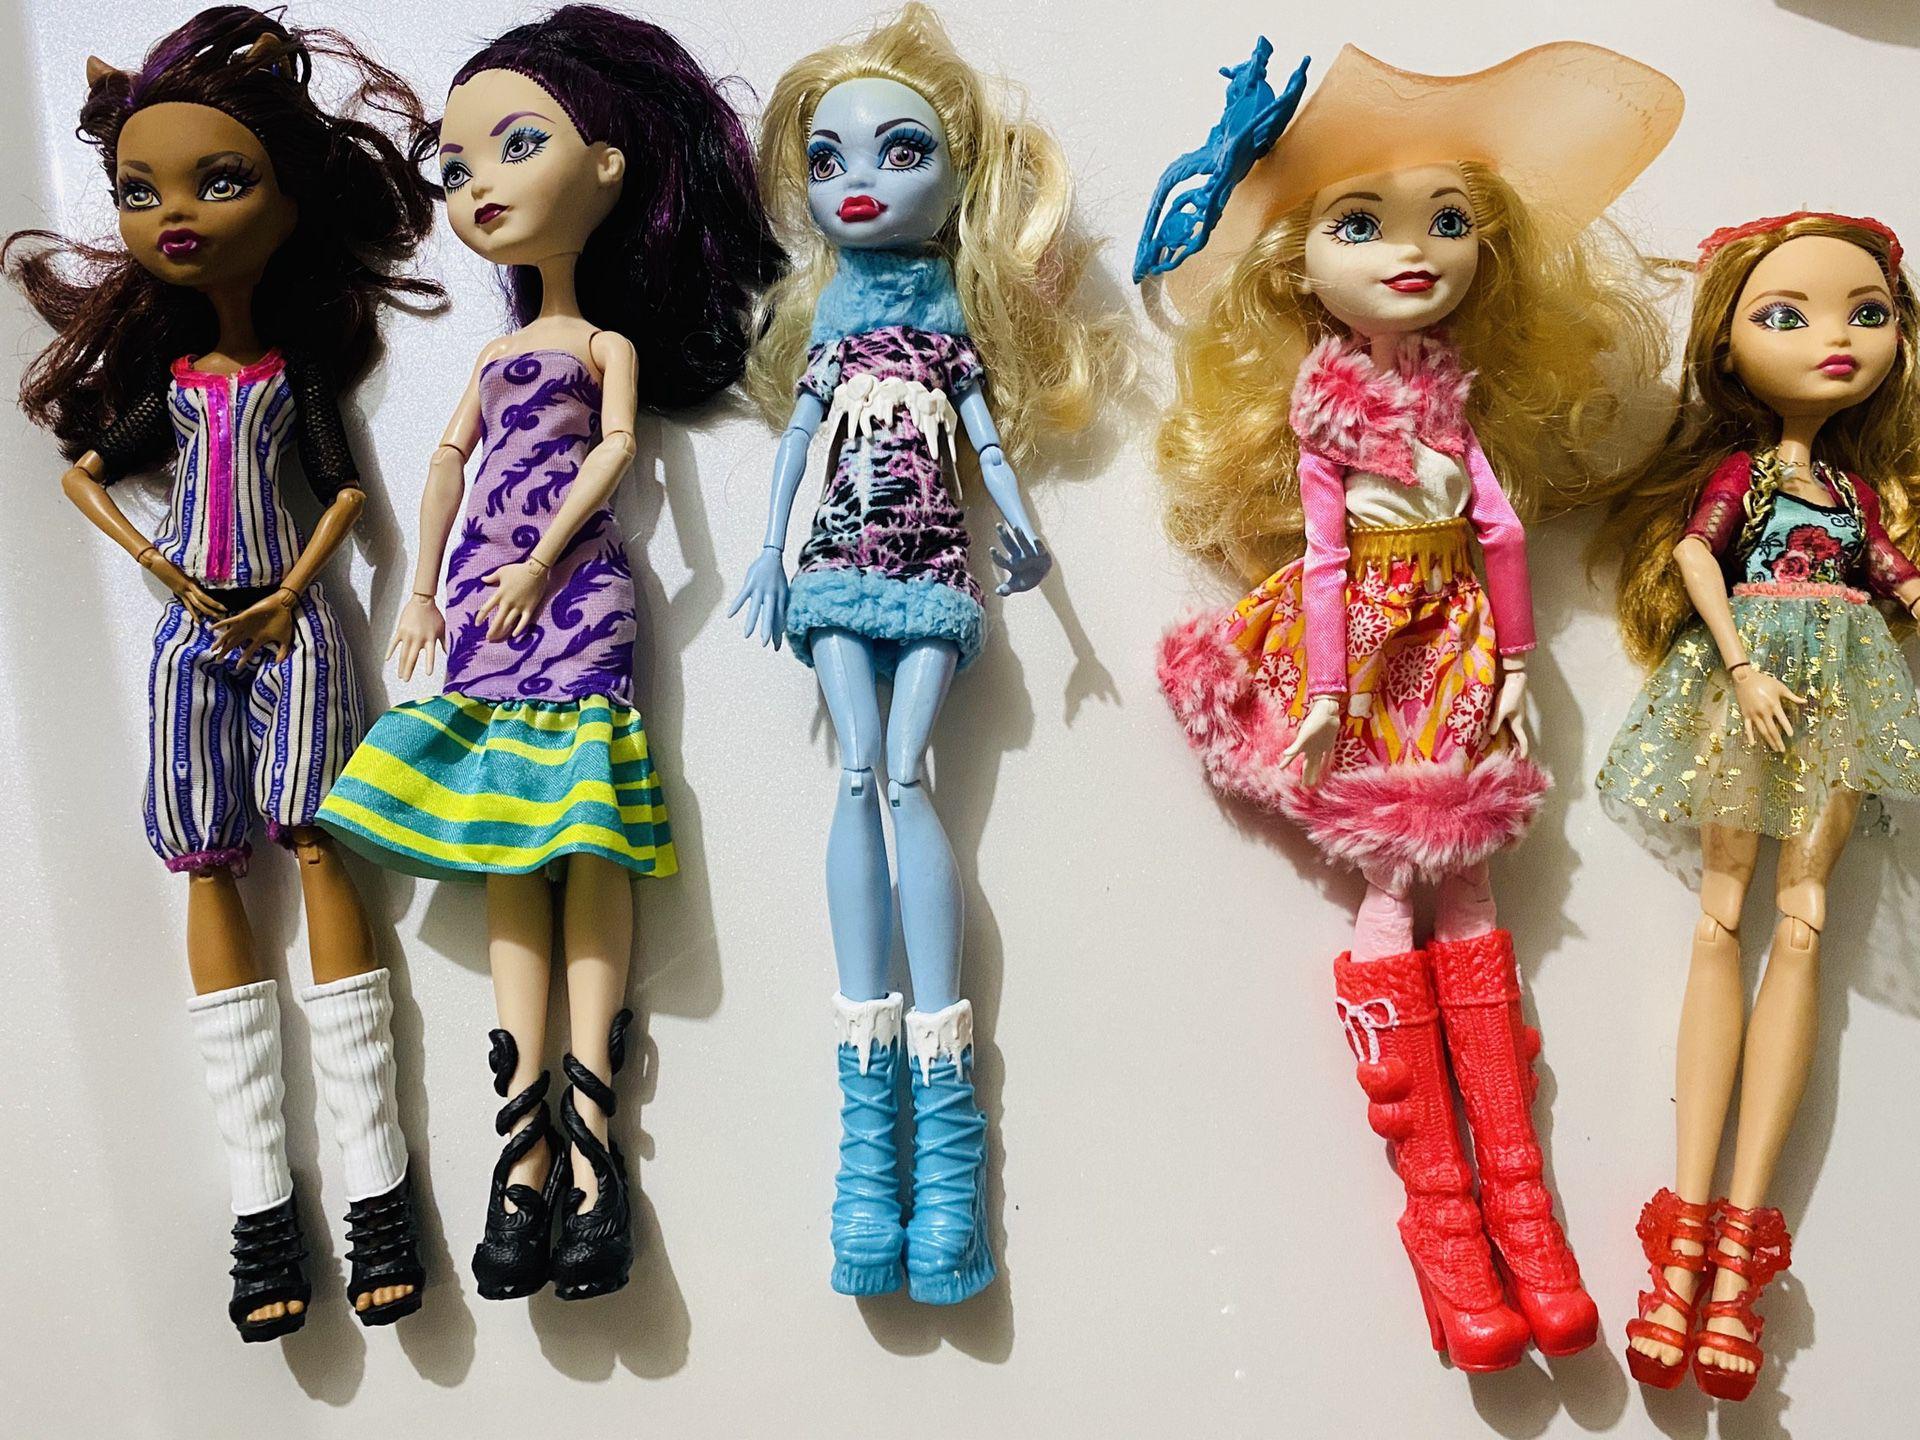 Monster High Doll $12 for one